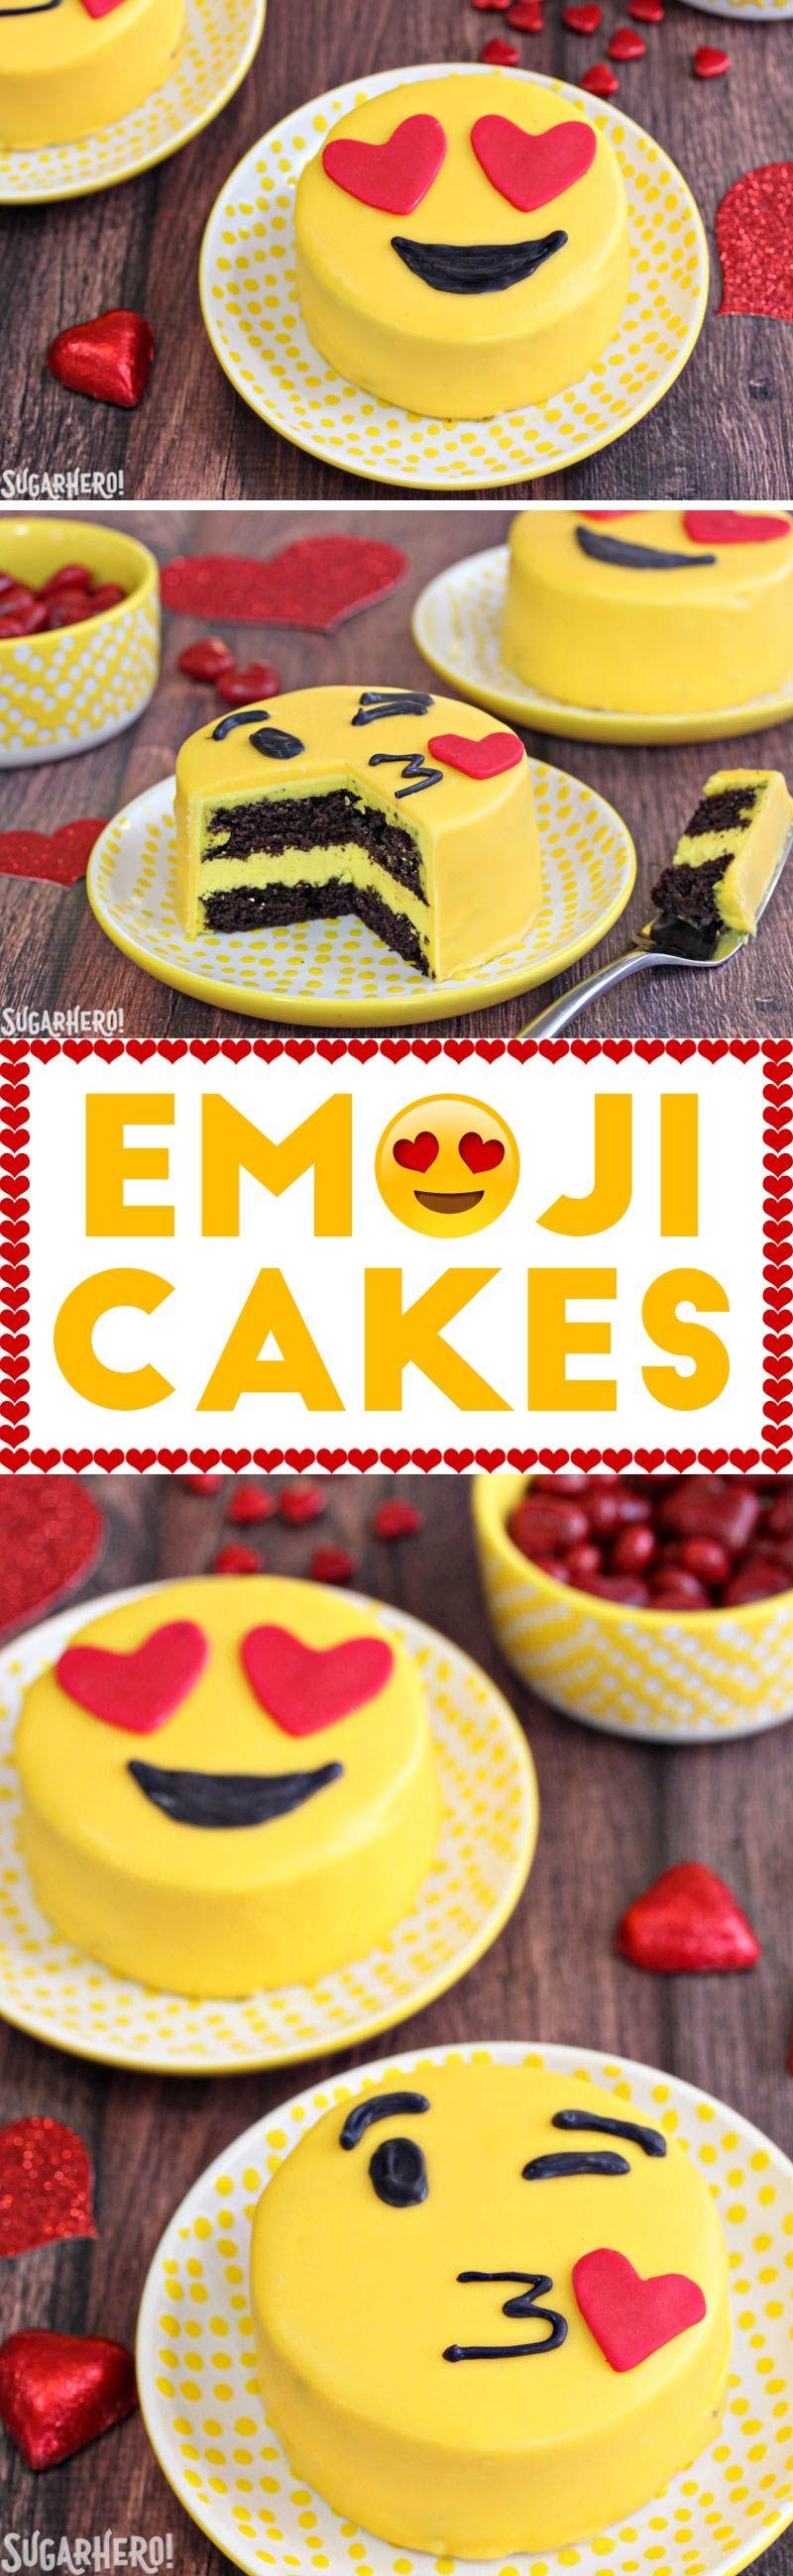 emoji cakes recipe mini chocolate cake emoji cake and emoji cakes